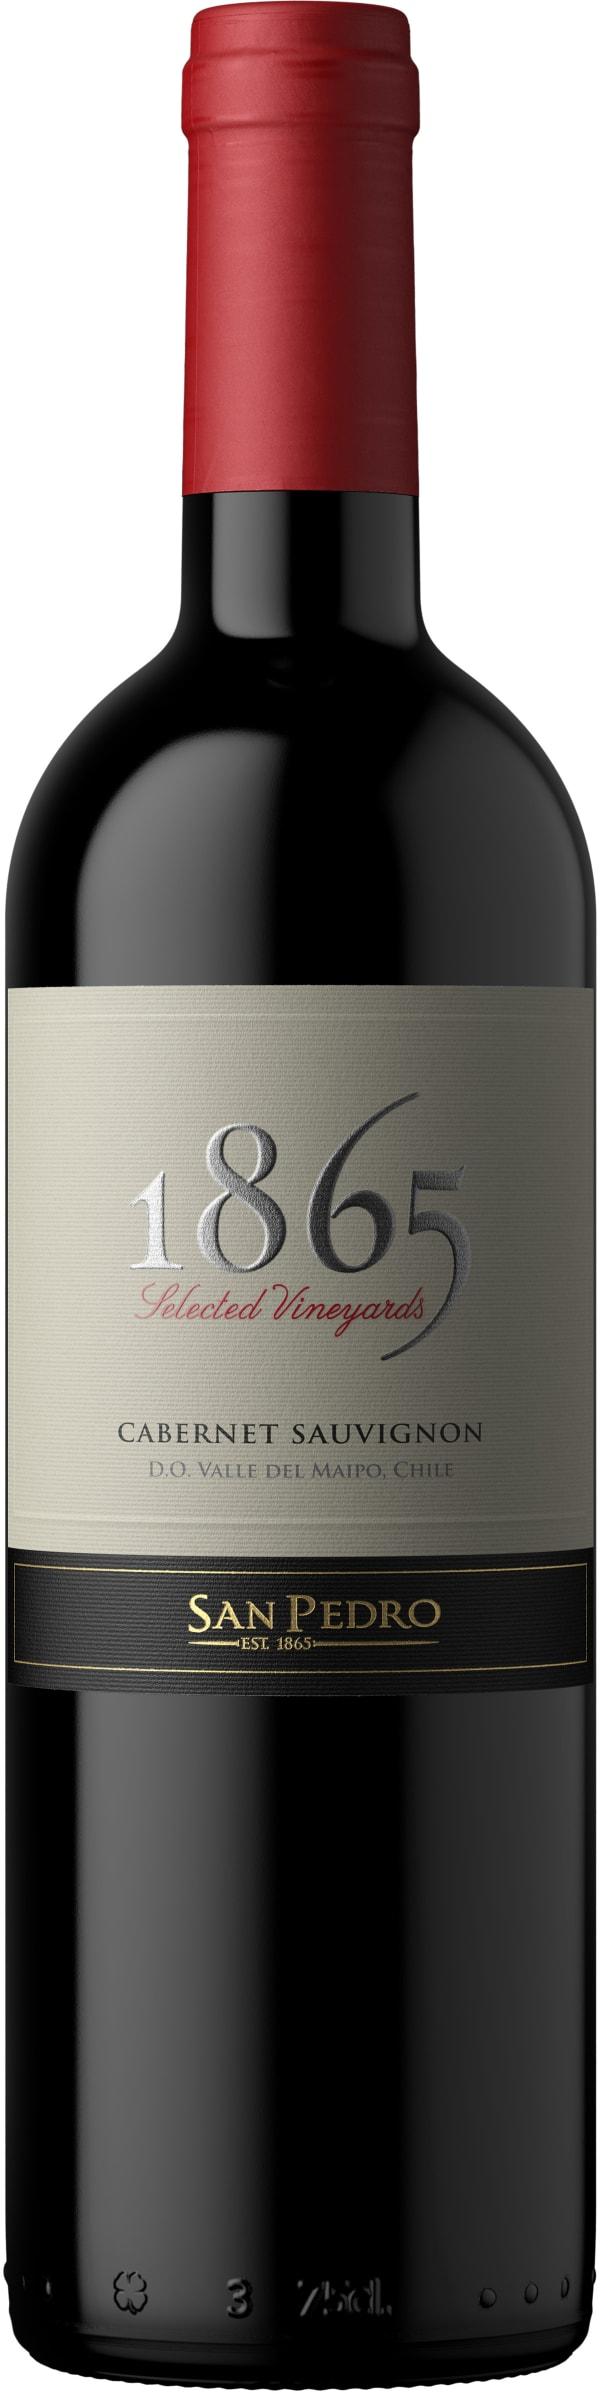 1865 Single Vineyard Cabernet Sauvignon 2014